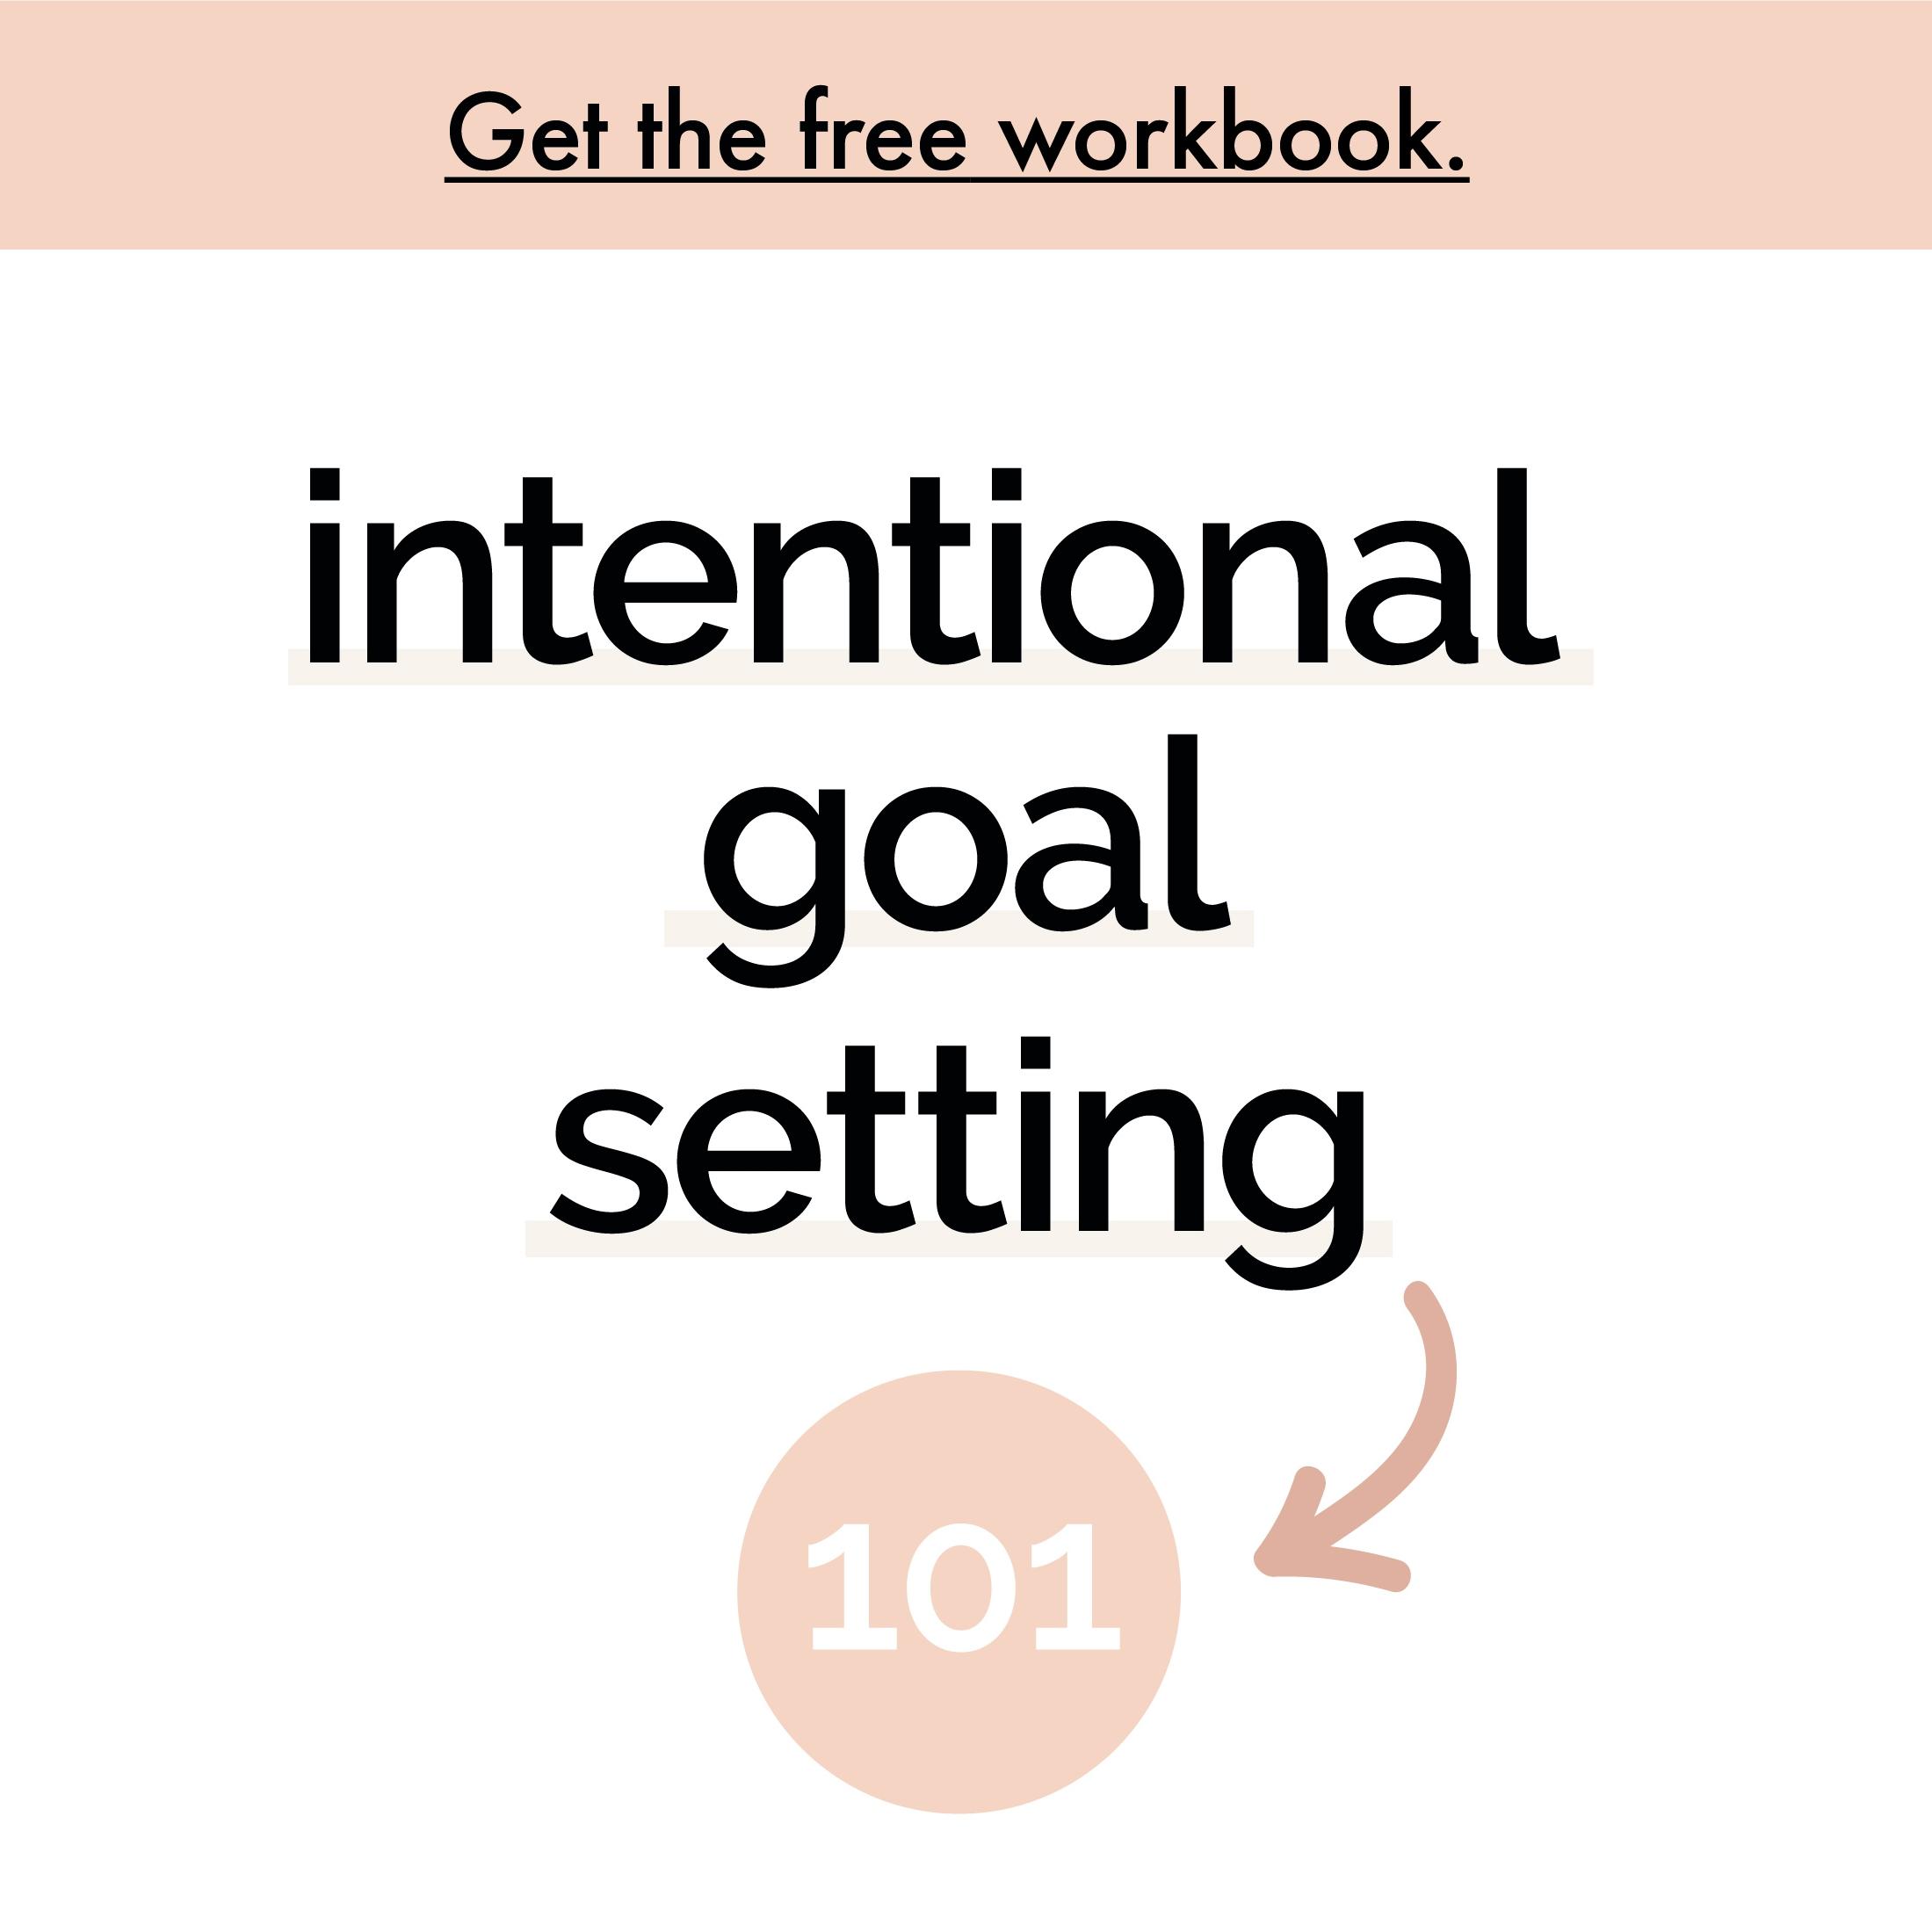 IG-Intentional-Goal-Setting-101-02.jpg